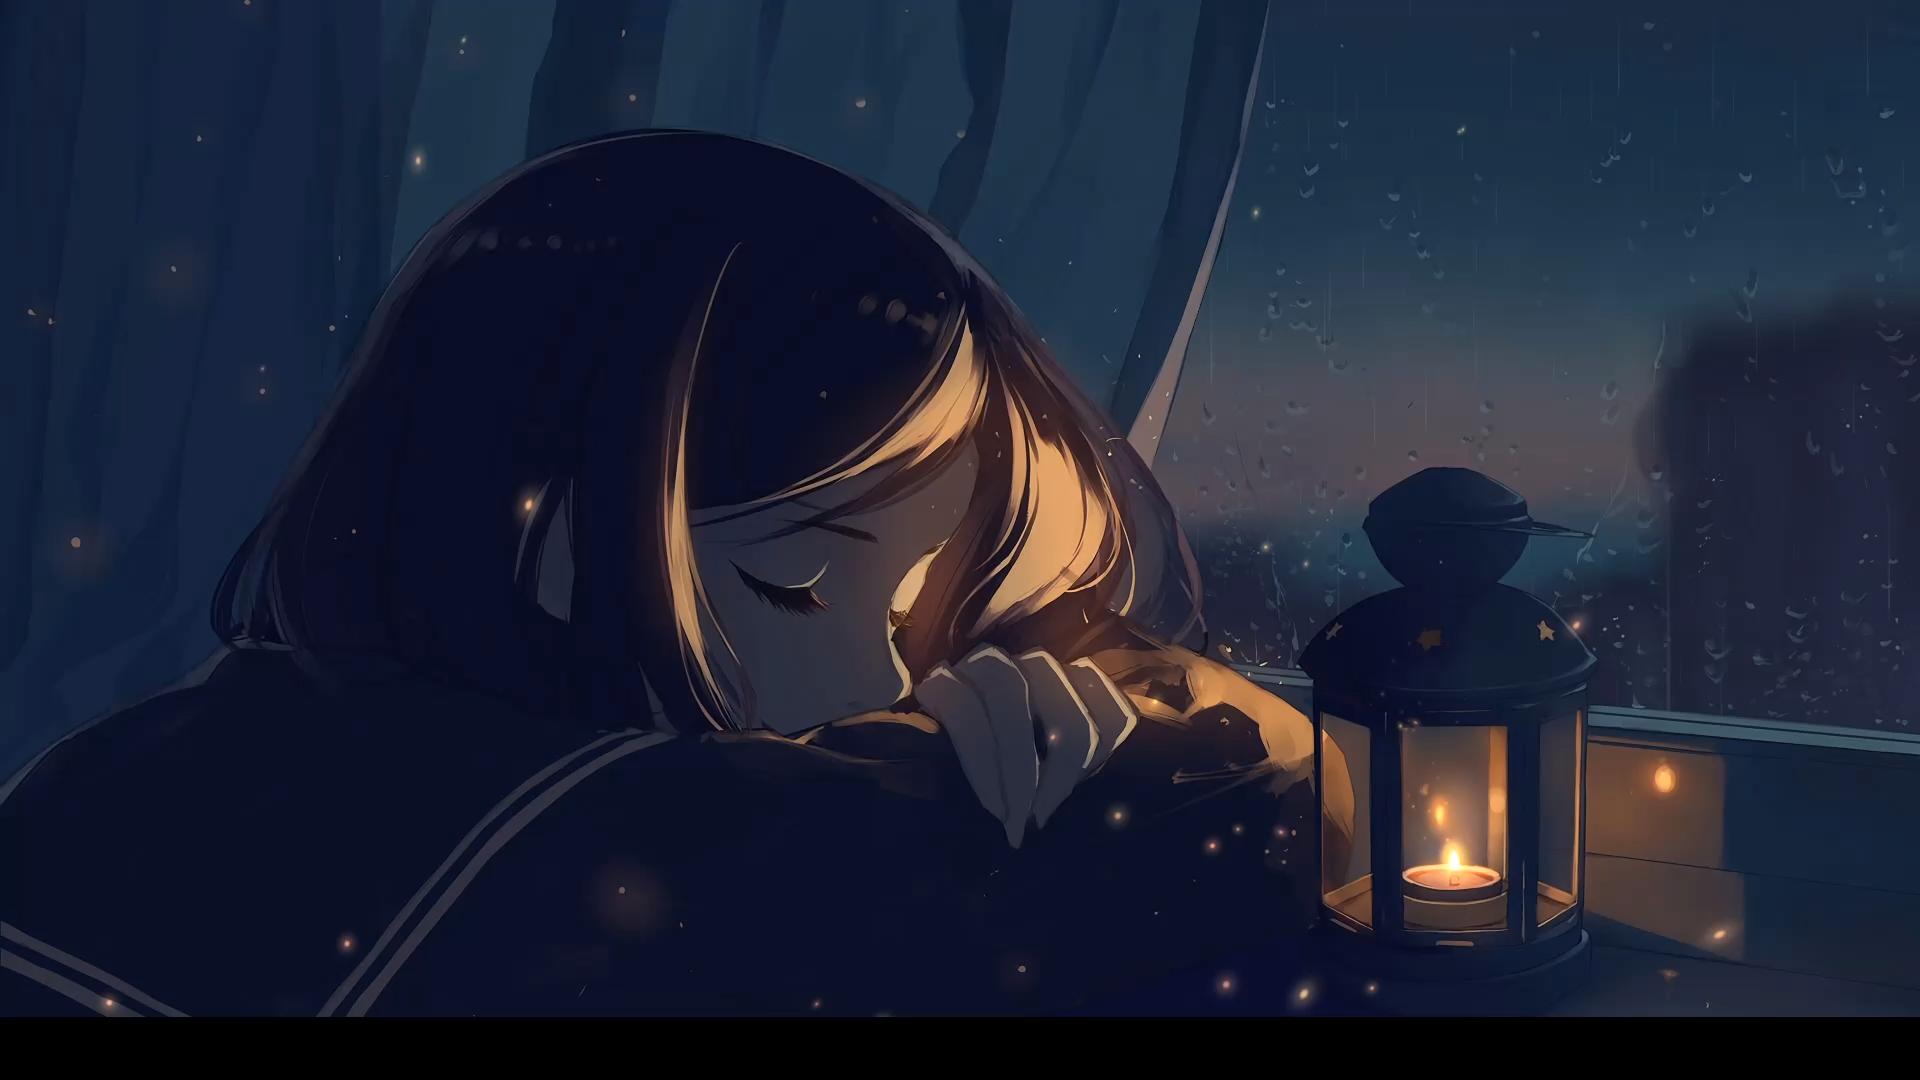 Falling Asleep Anime Wallpaper Video Anime Scenery Anime Art Beautiful Lonely Art